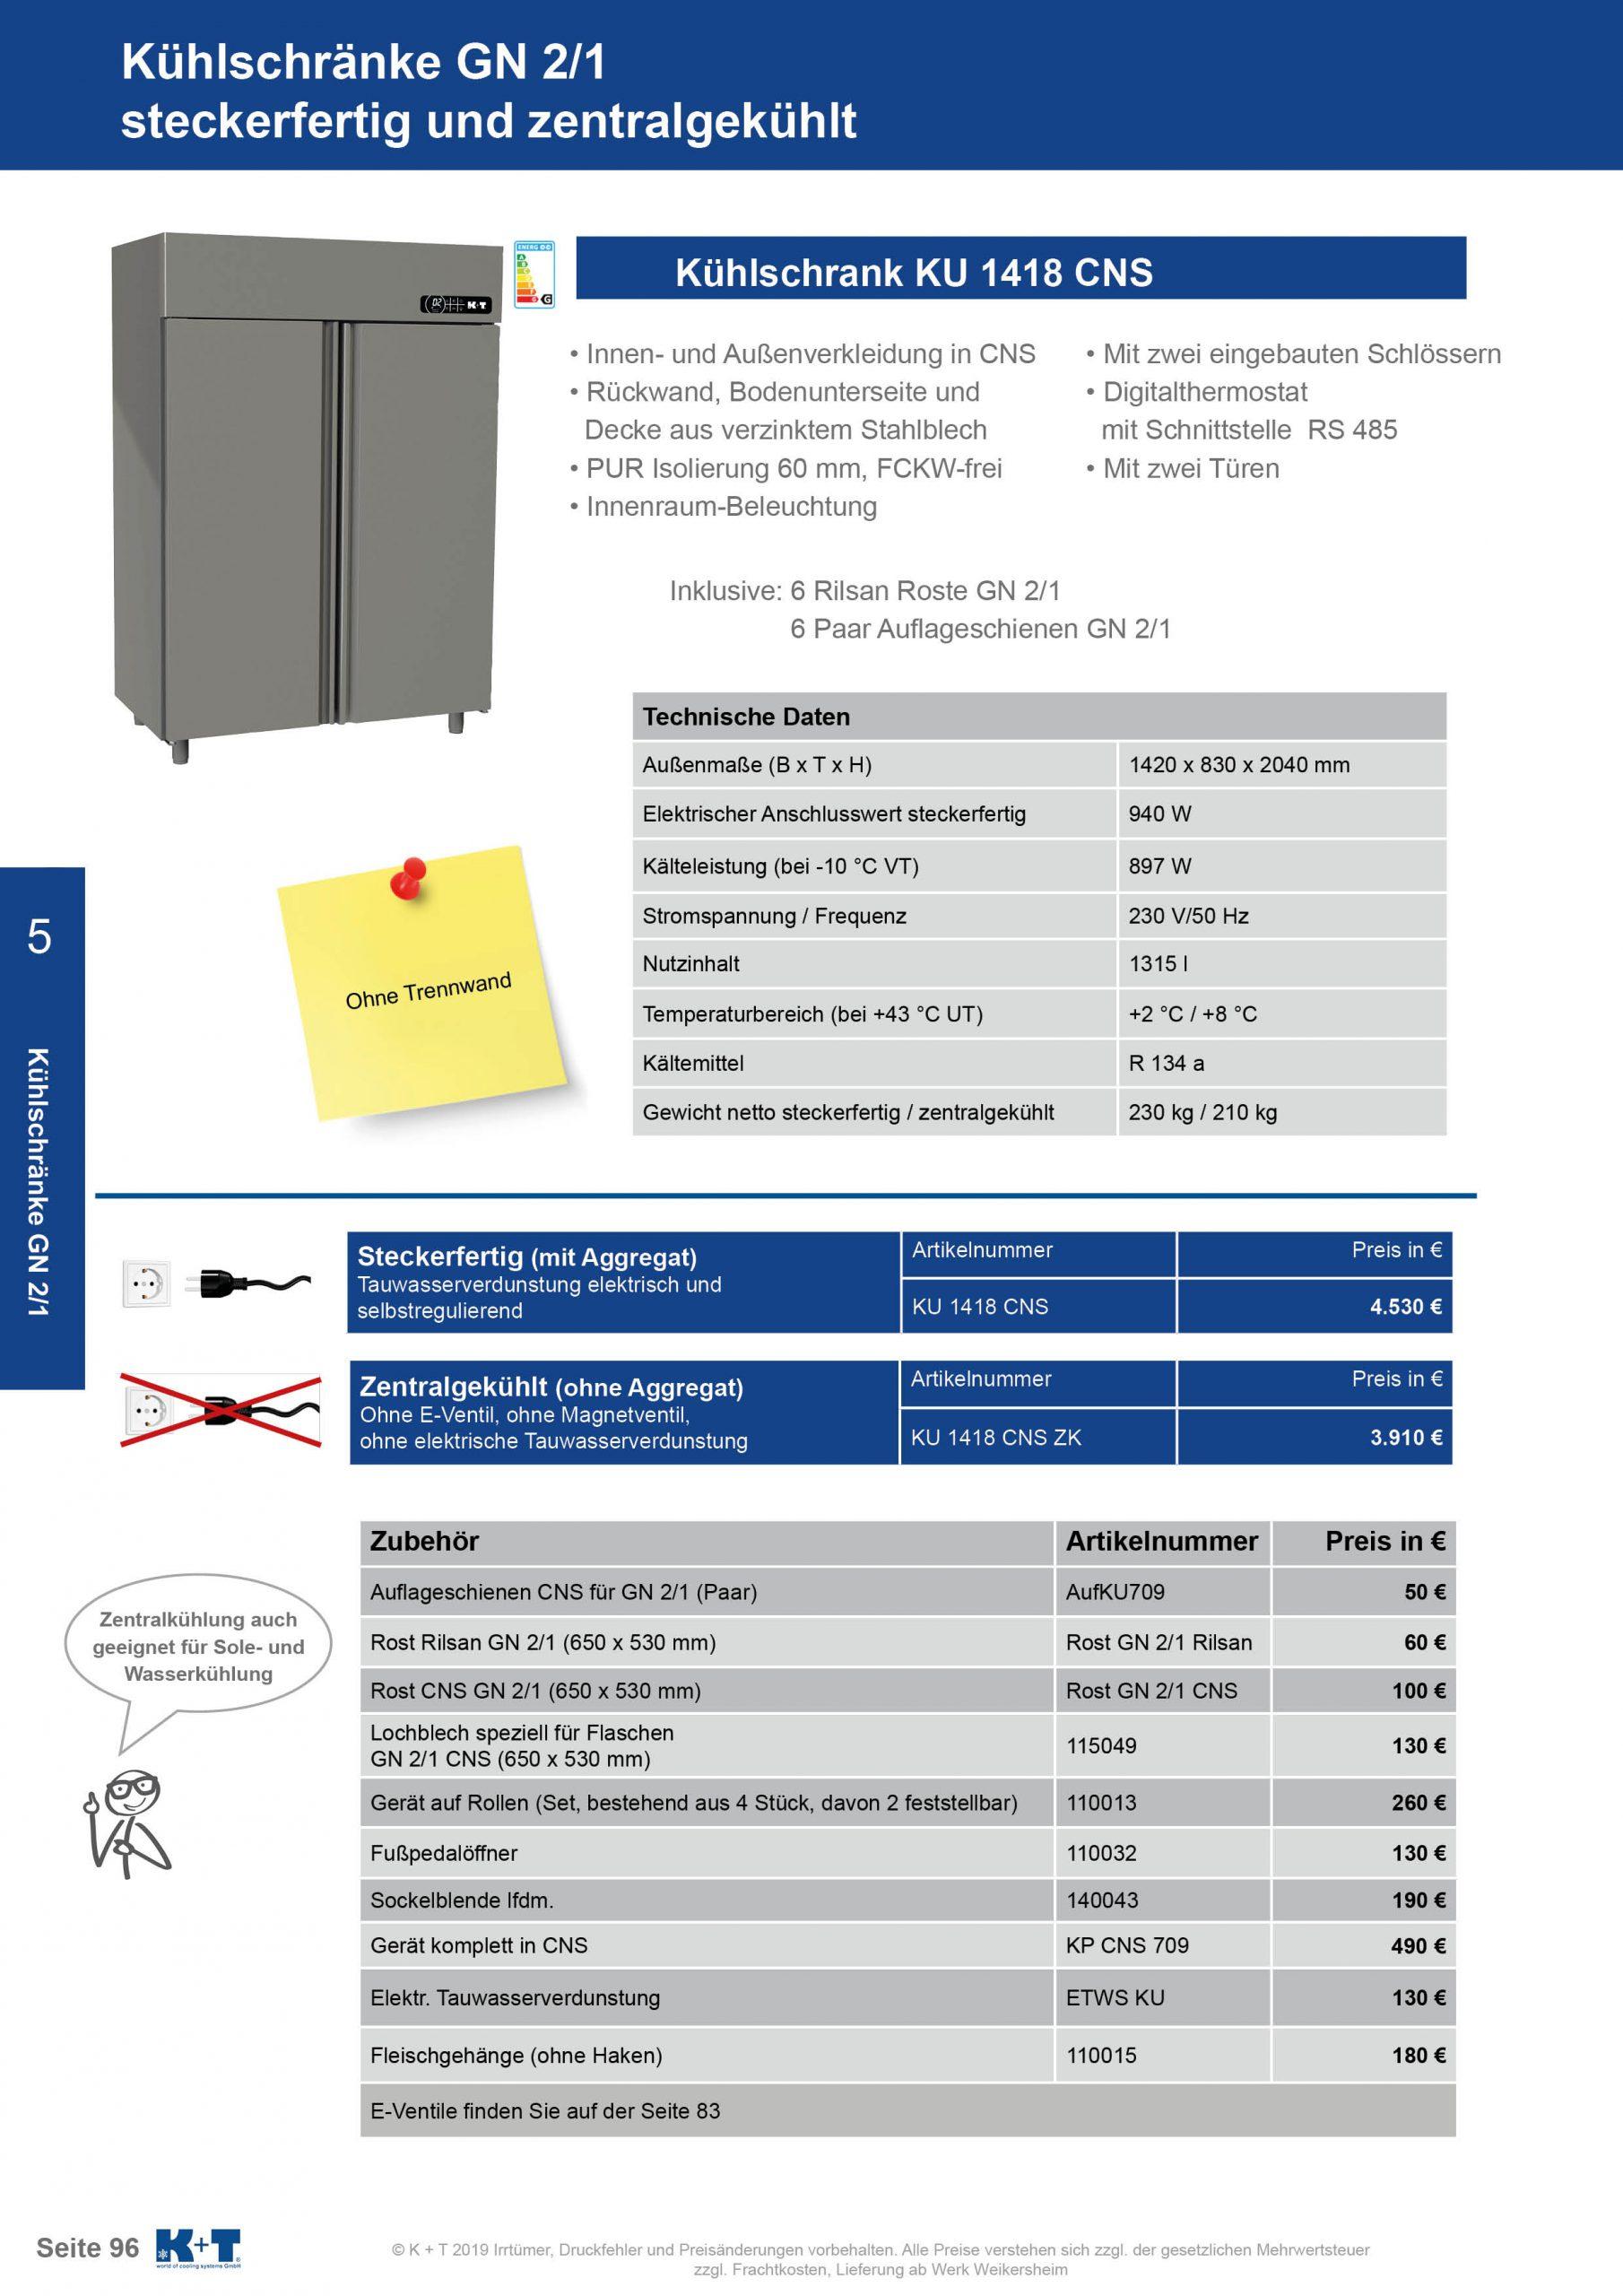 Kühlschränke GN 2_1 Doppeltürenkühlschrank zentralgekühlt